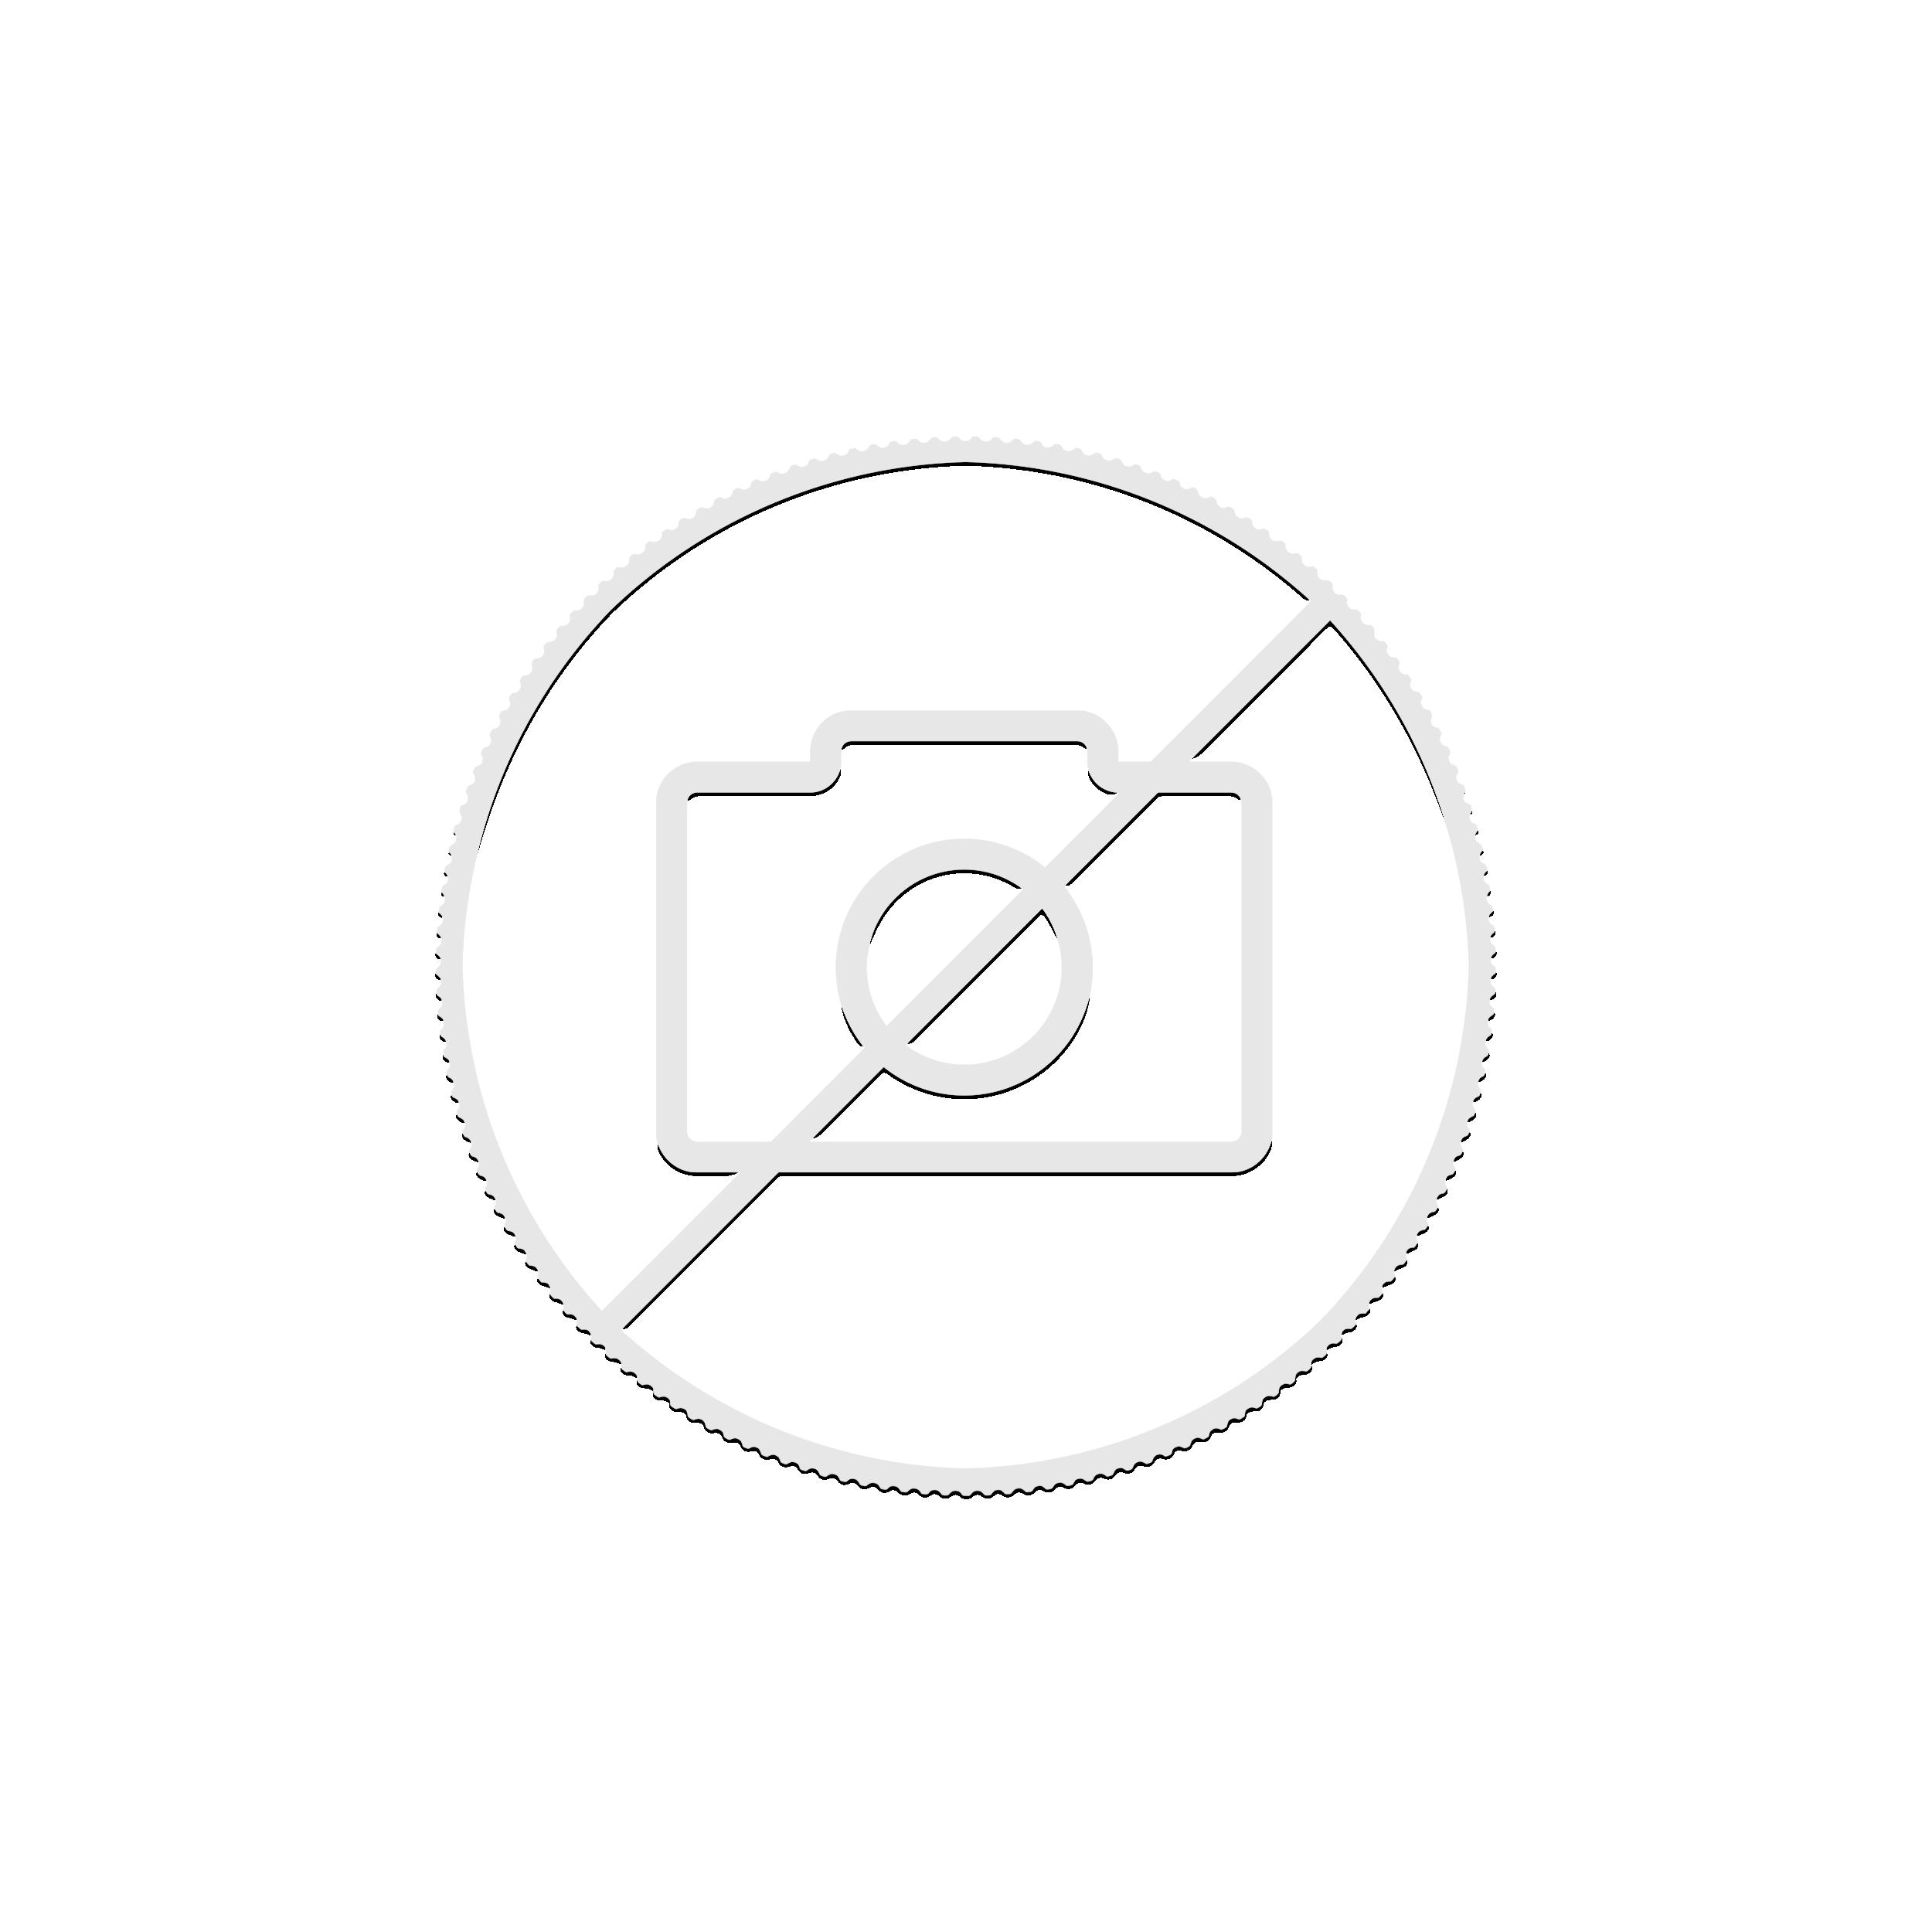 1 Kilo silver coin Somalia Elephant 2018